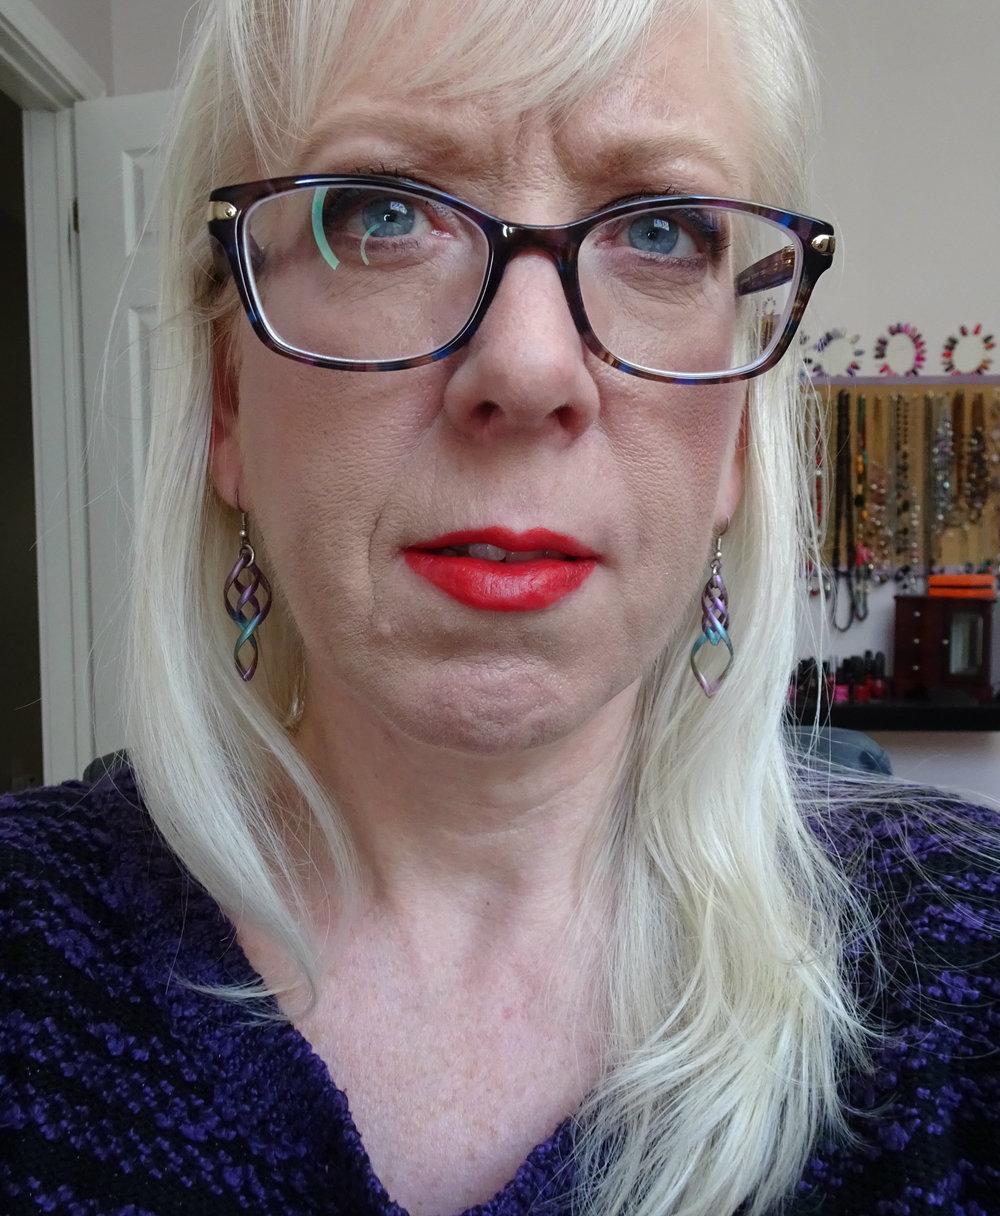 Dior Rouge Lipstick in 999 Matte